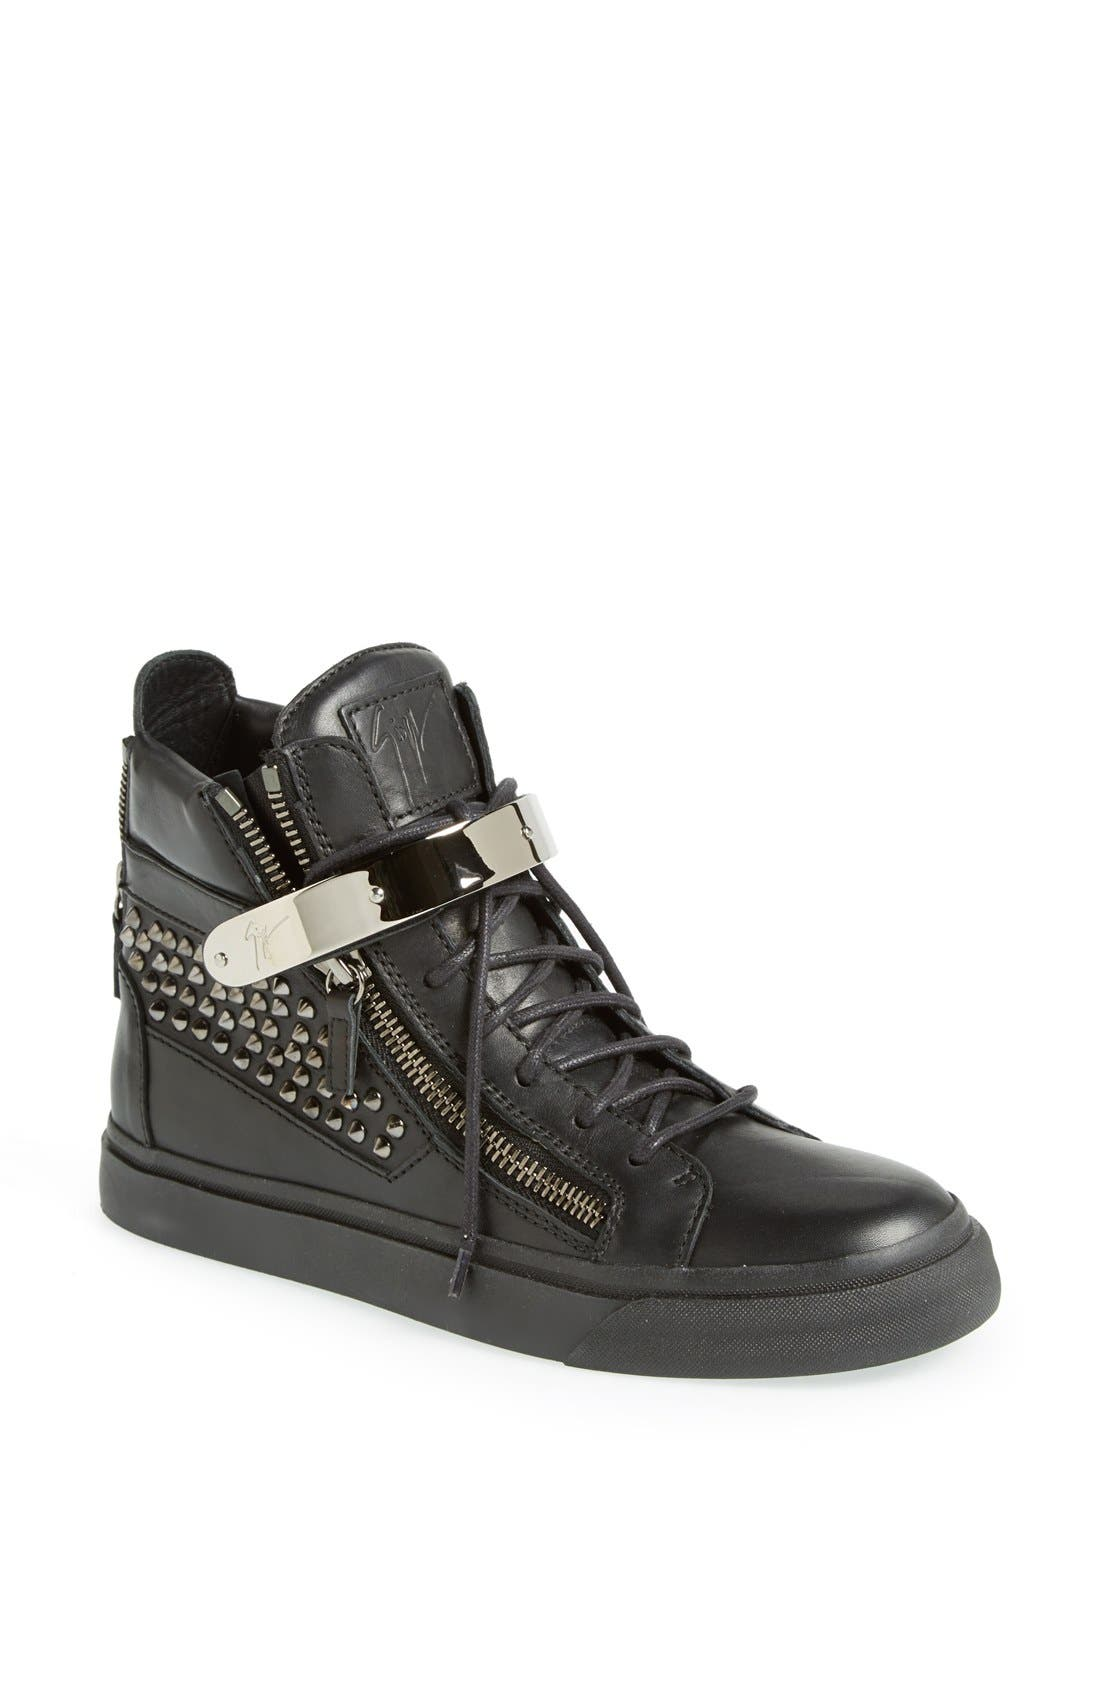 Main Image - Giuseppe Zanotti Studded High Top Sneaker (Women)